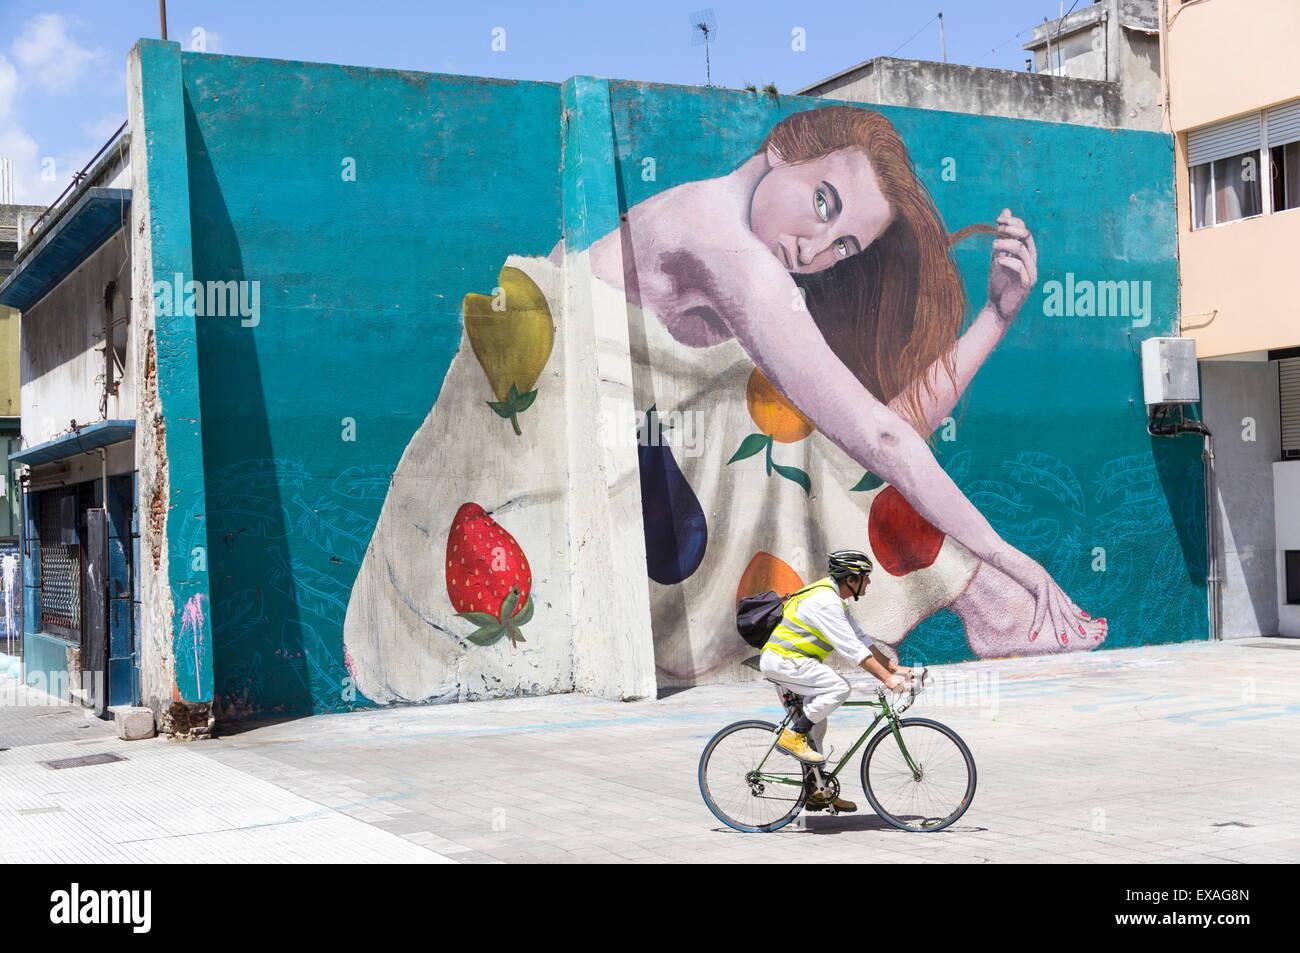 Graffiti, Montevideo, Uruguay, South America - Stock Image